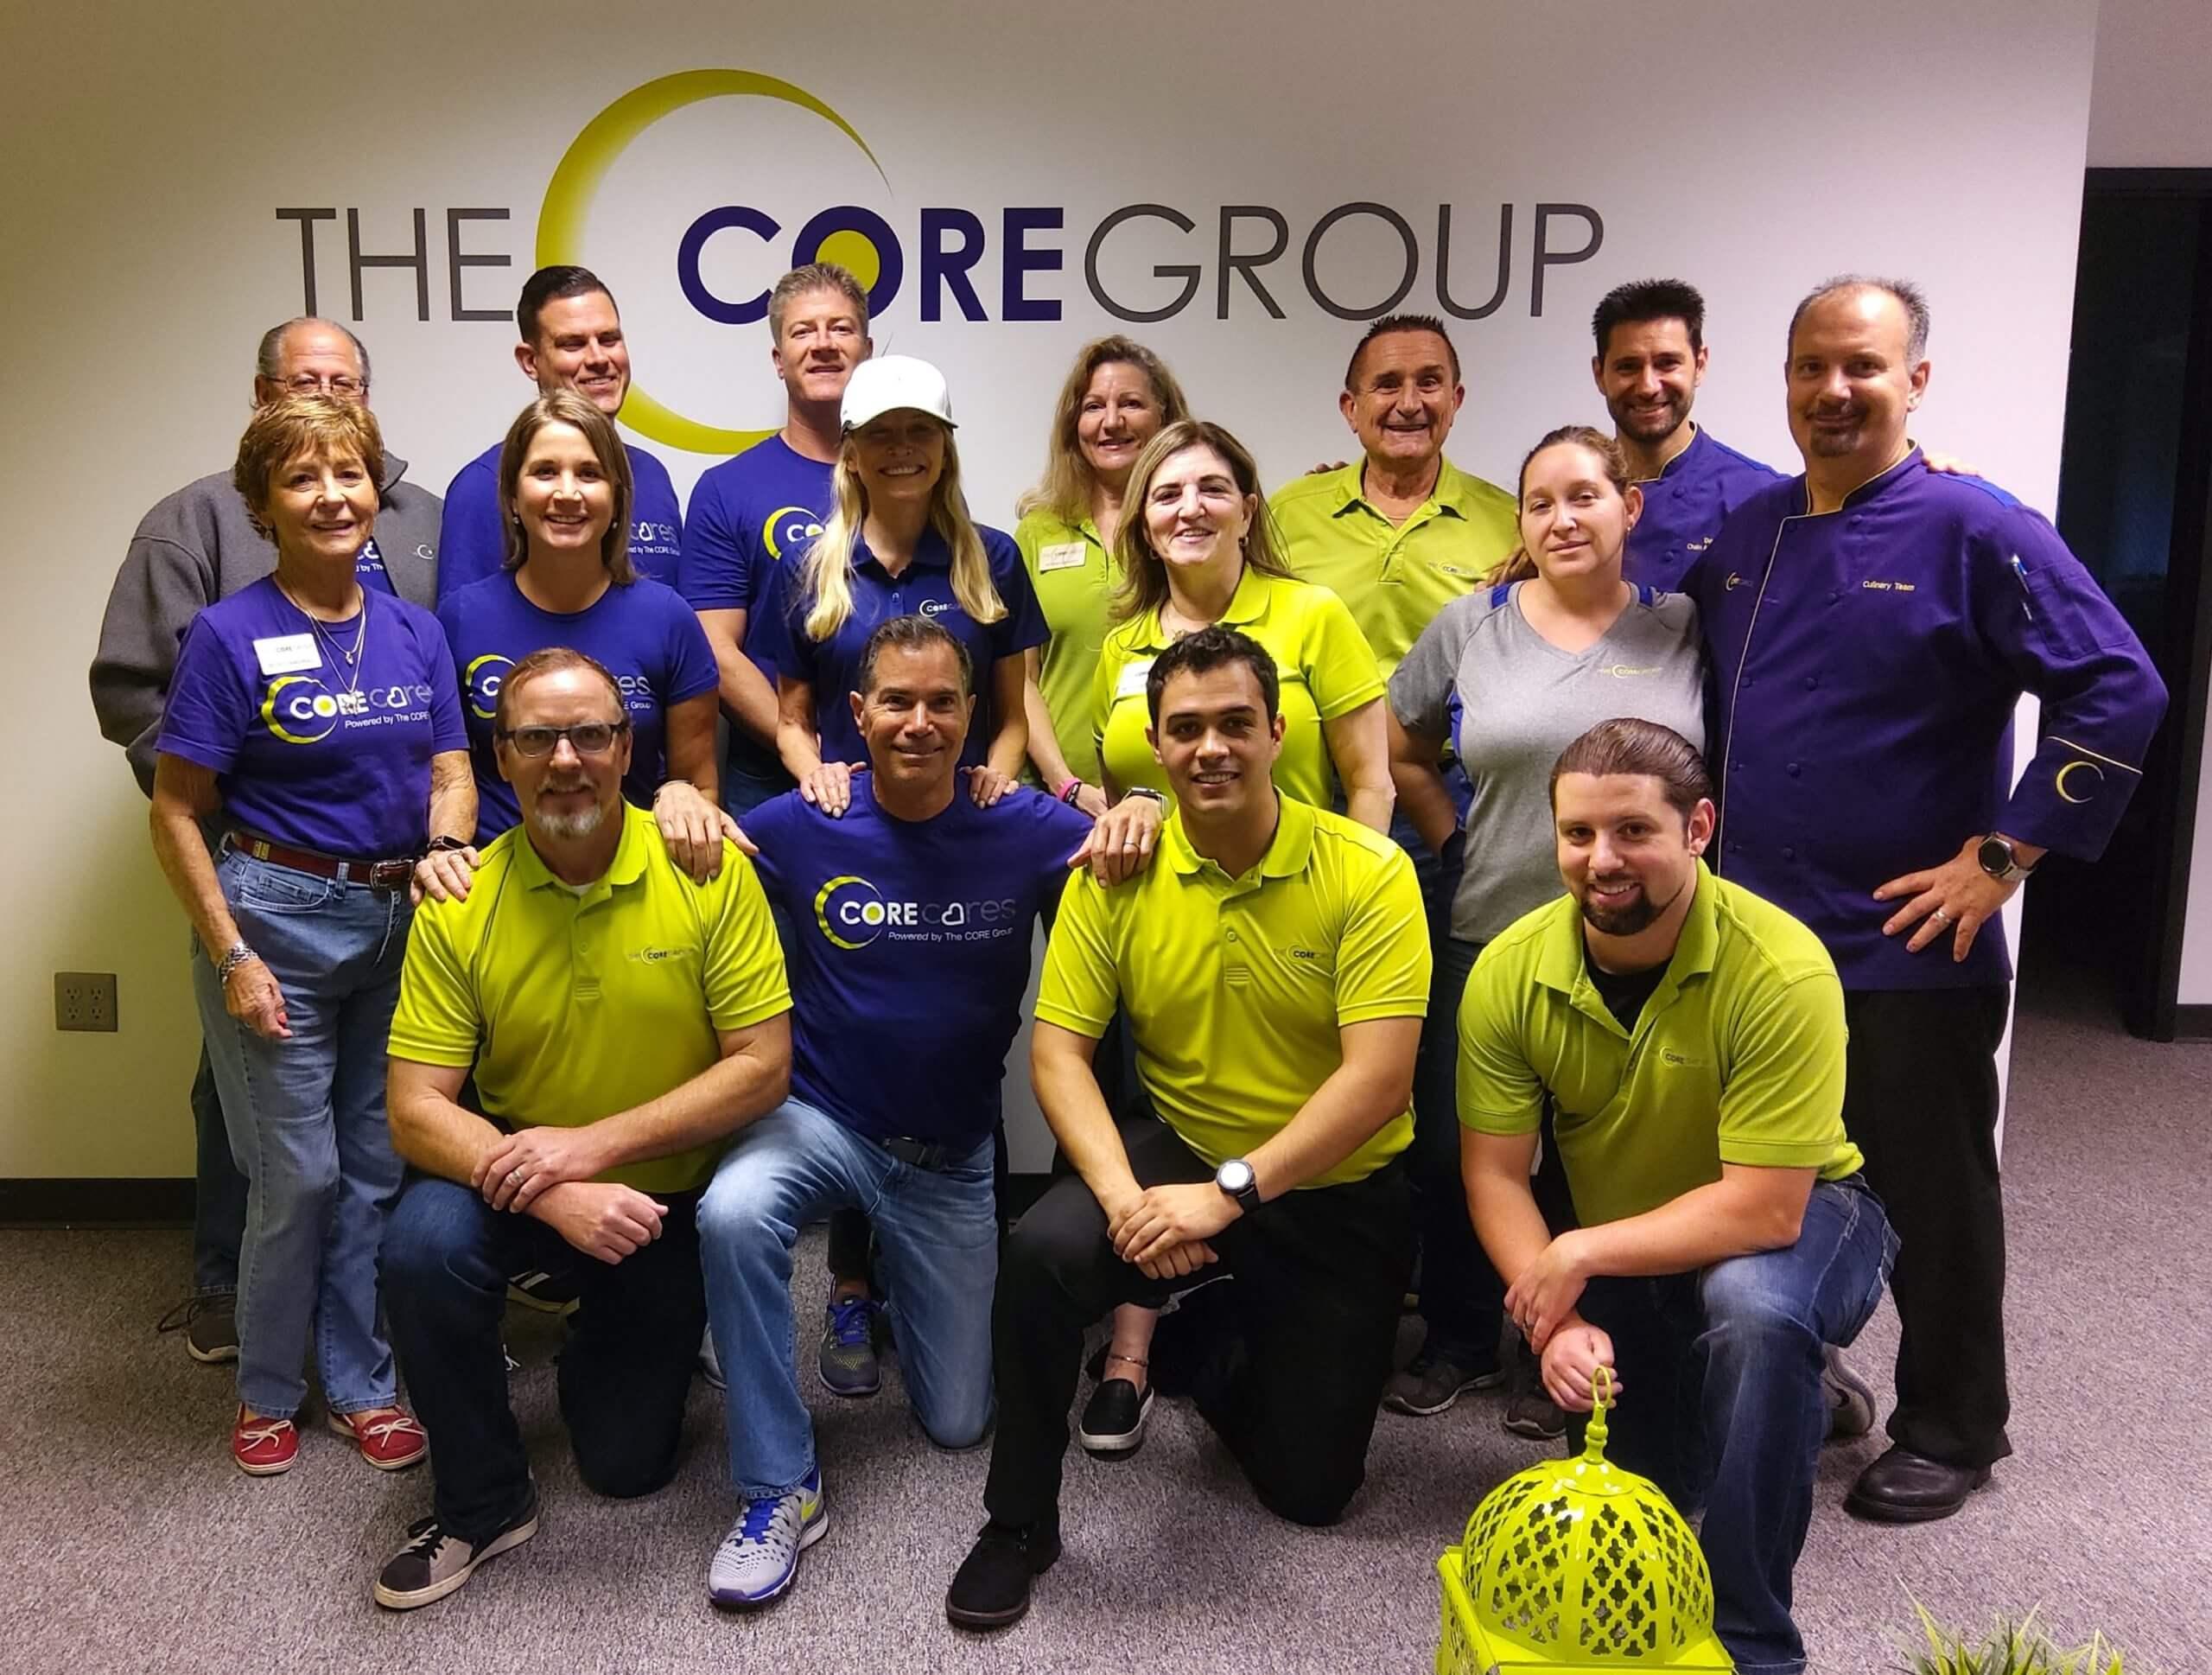 season of core caring 18